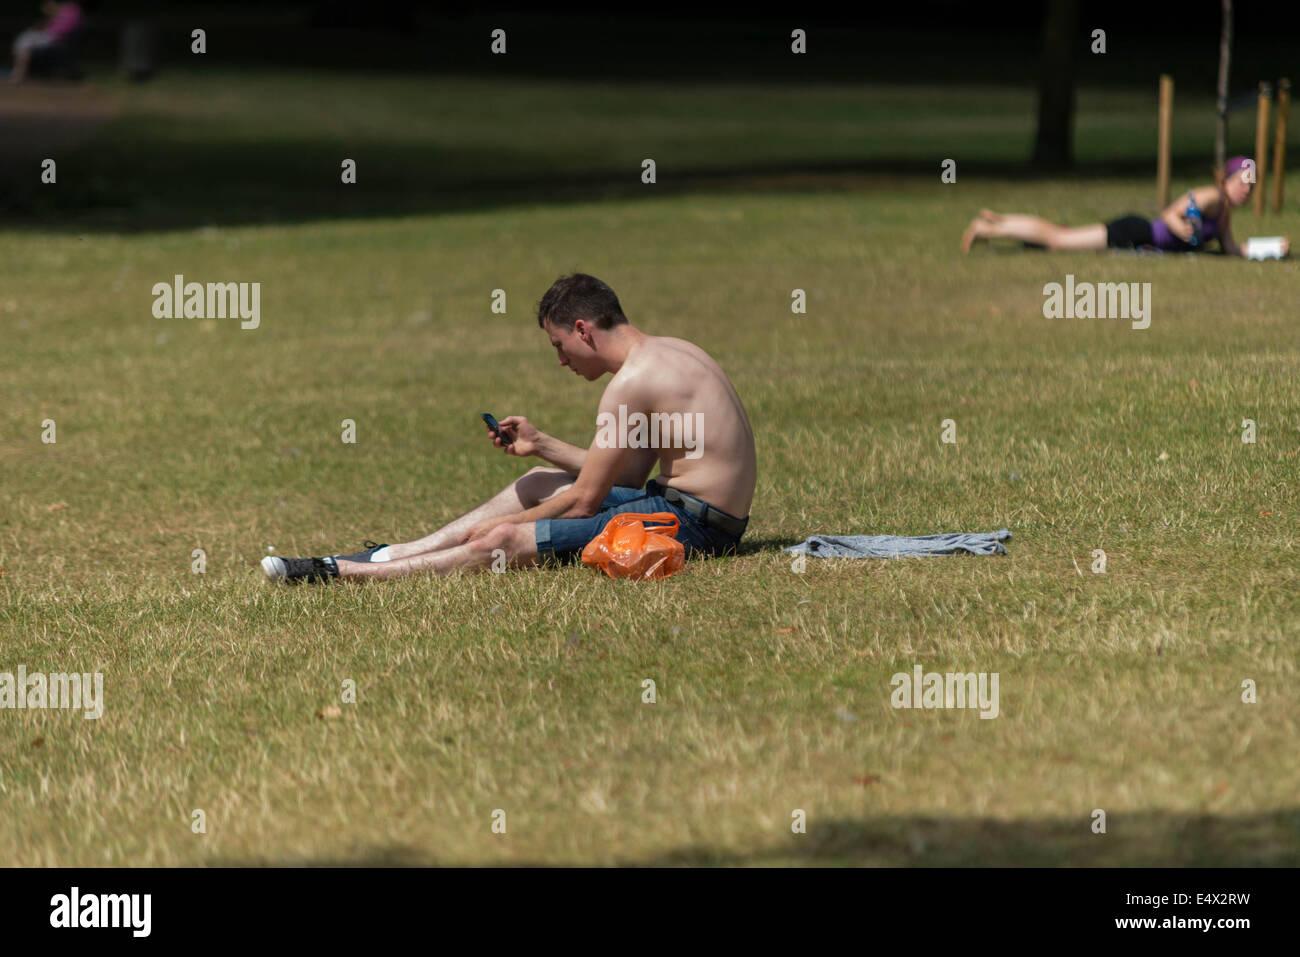 London, UK. 17th July, 2014. Londoners enjoying the summer heatwave. © Velar Grant/Alamy Live News London, - Stock Image